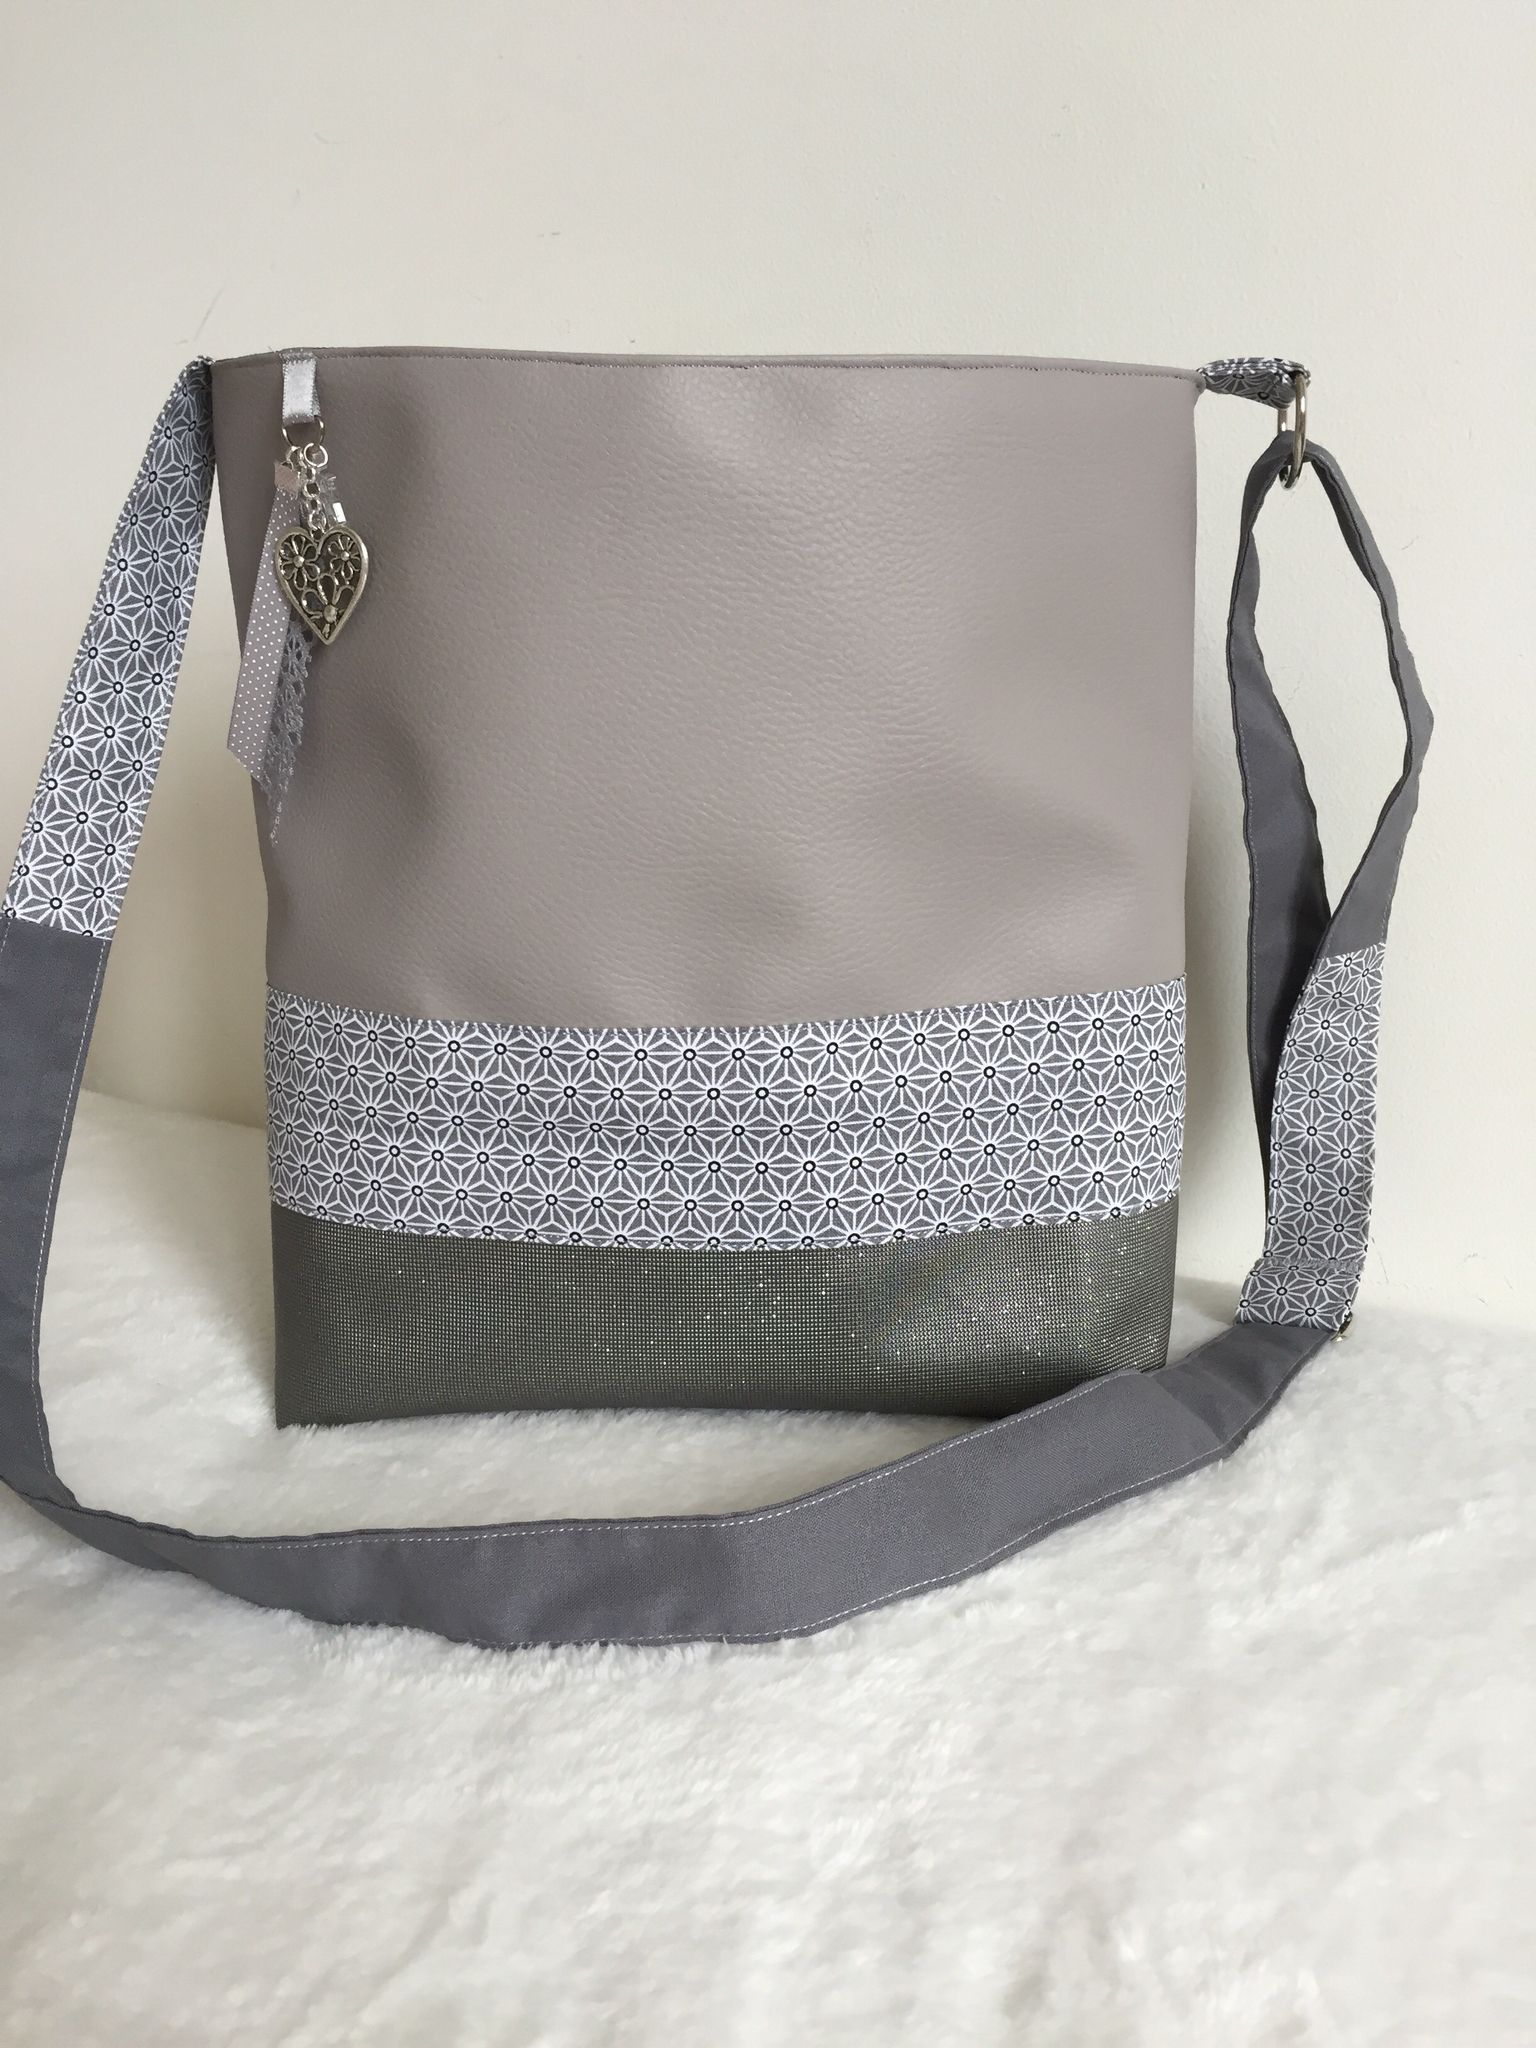 1f75c7bf09c59 Sac bandoulière en simili cuir gris …   BOLSOS Y BOLSITOS   Coutu…